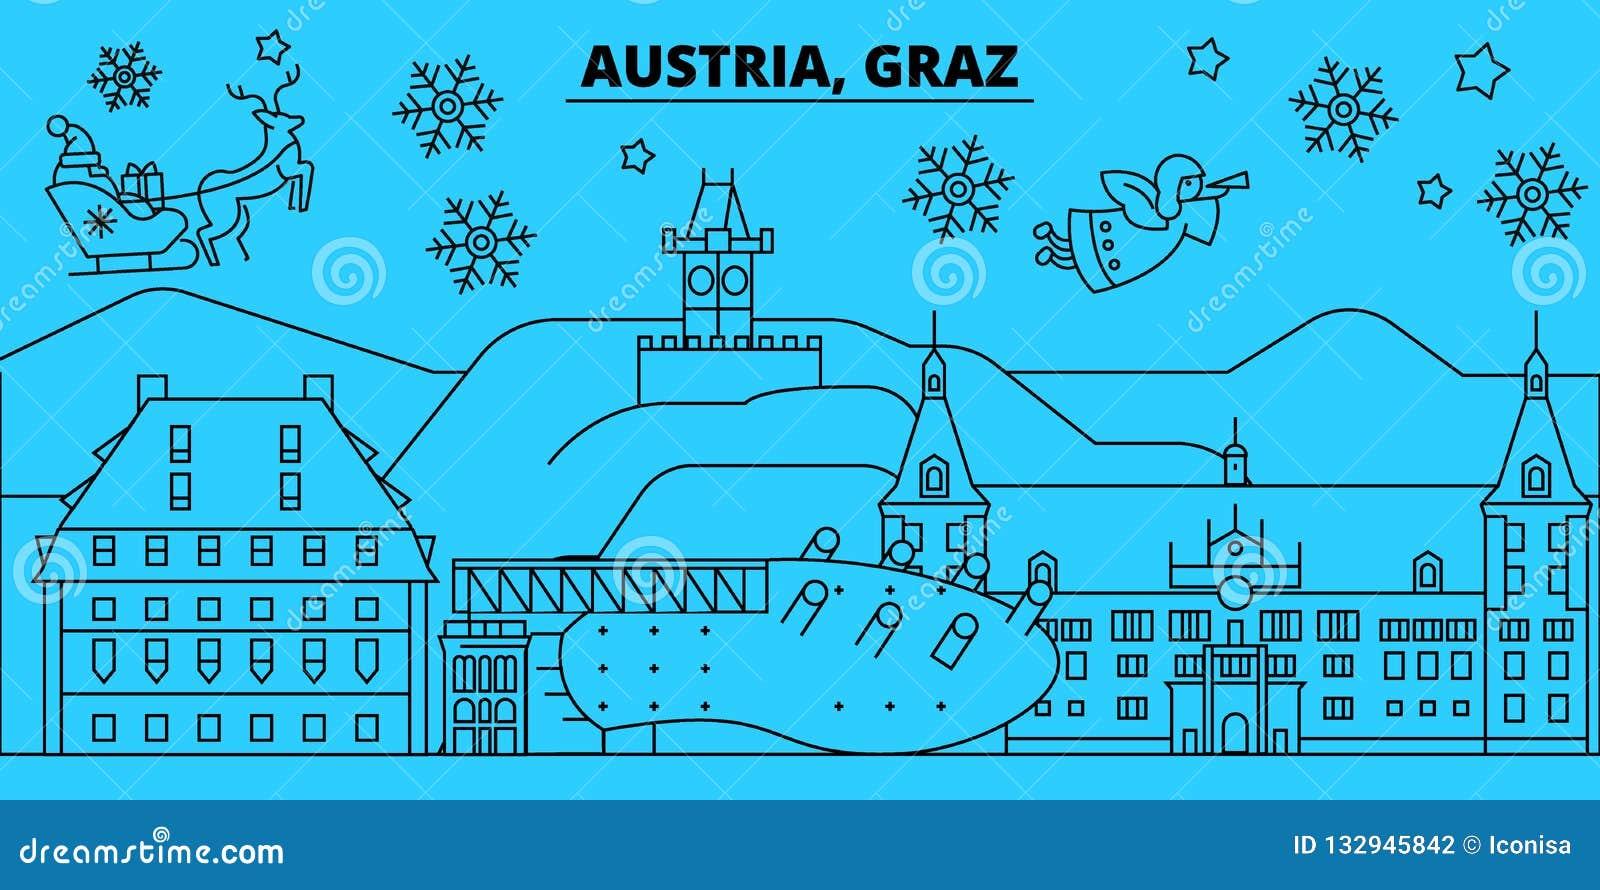 Christmas In Austria Holidays.Austria Graz Winter Holidays Skyline Merry Christmas